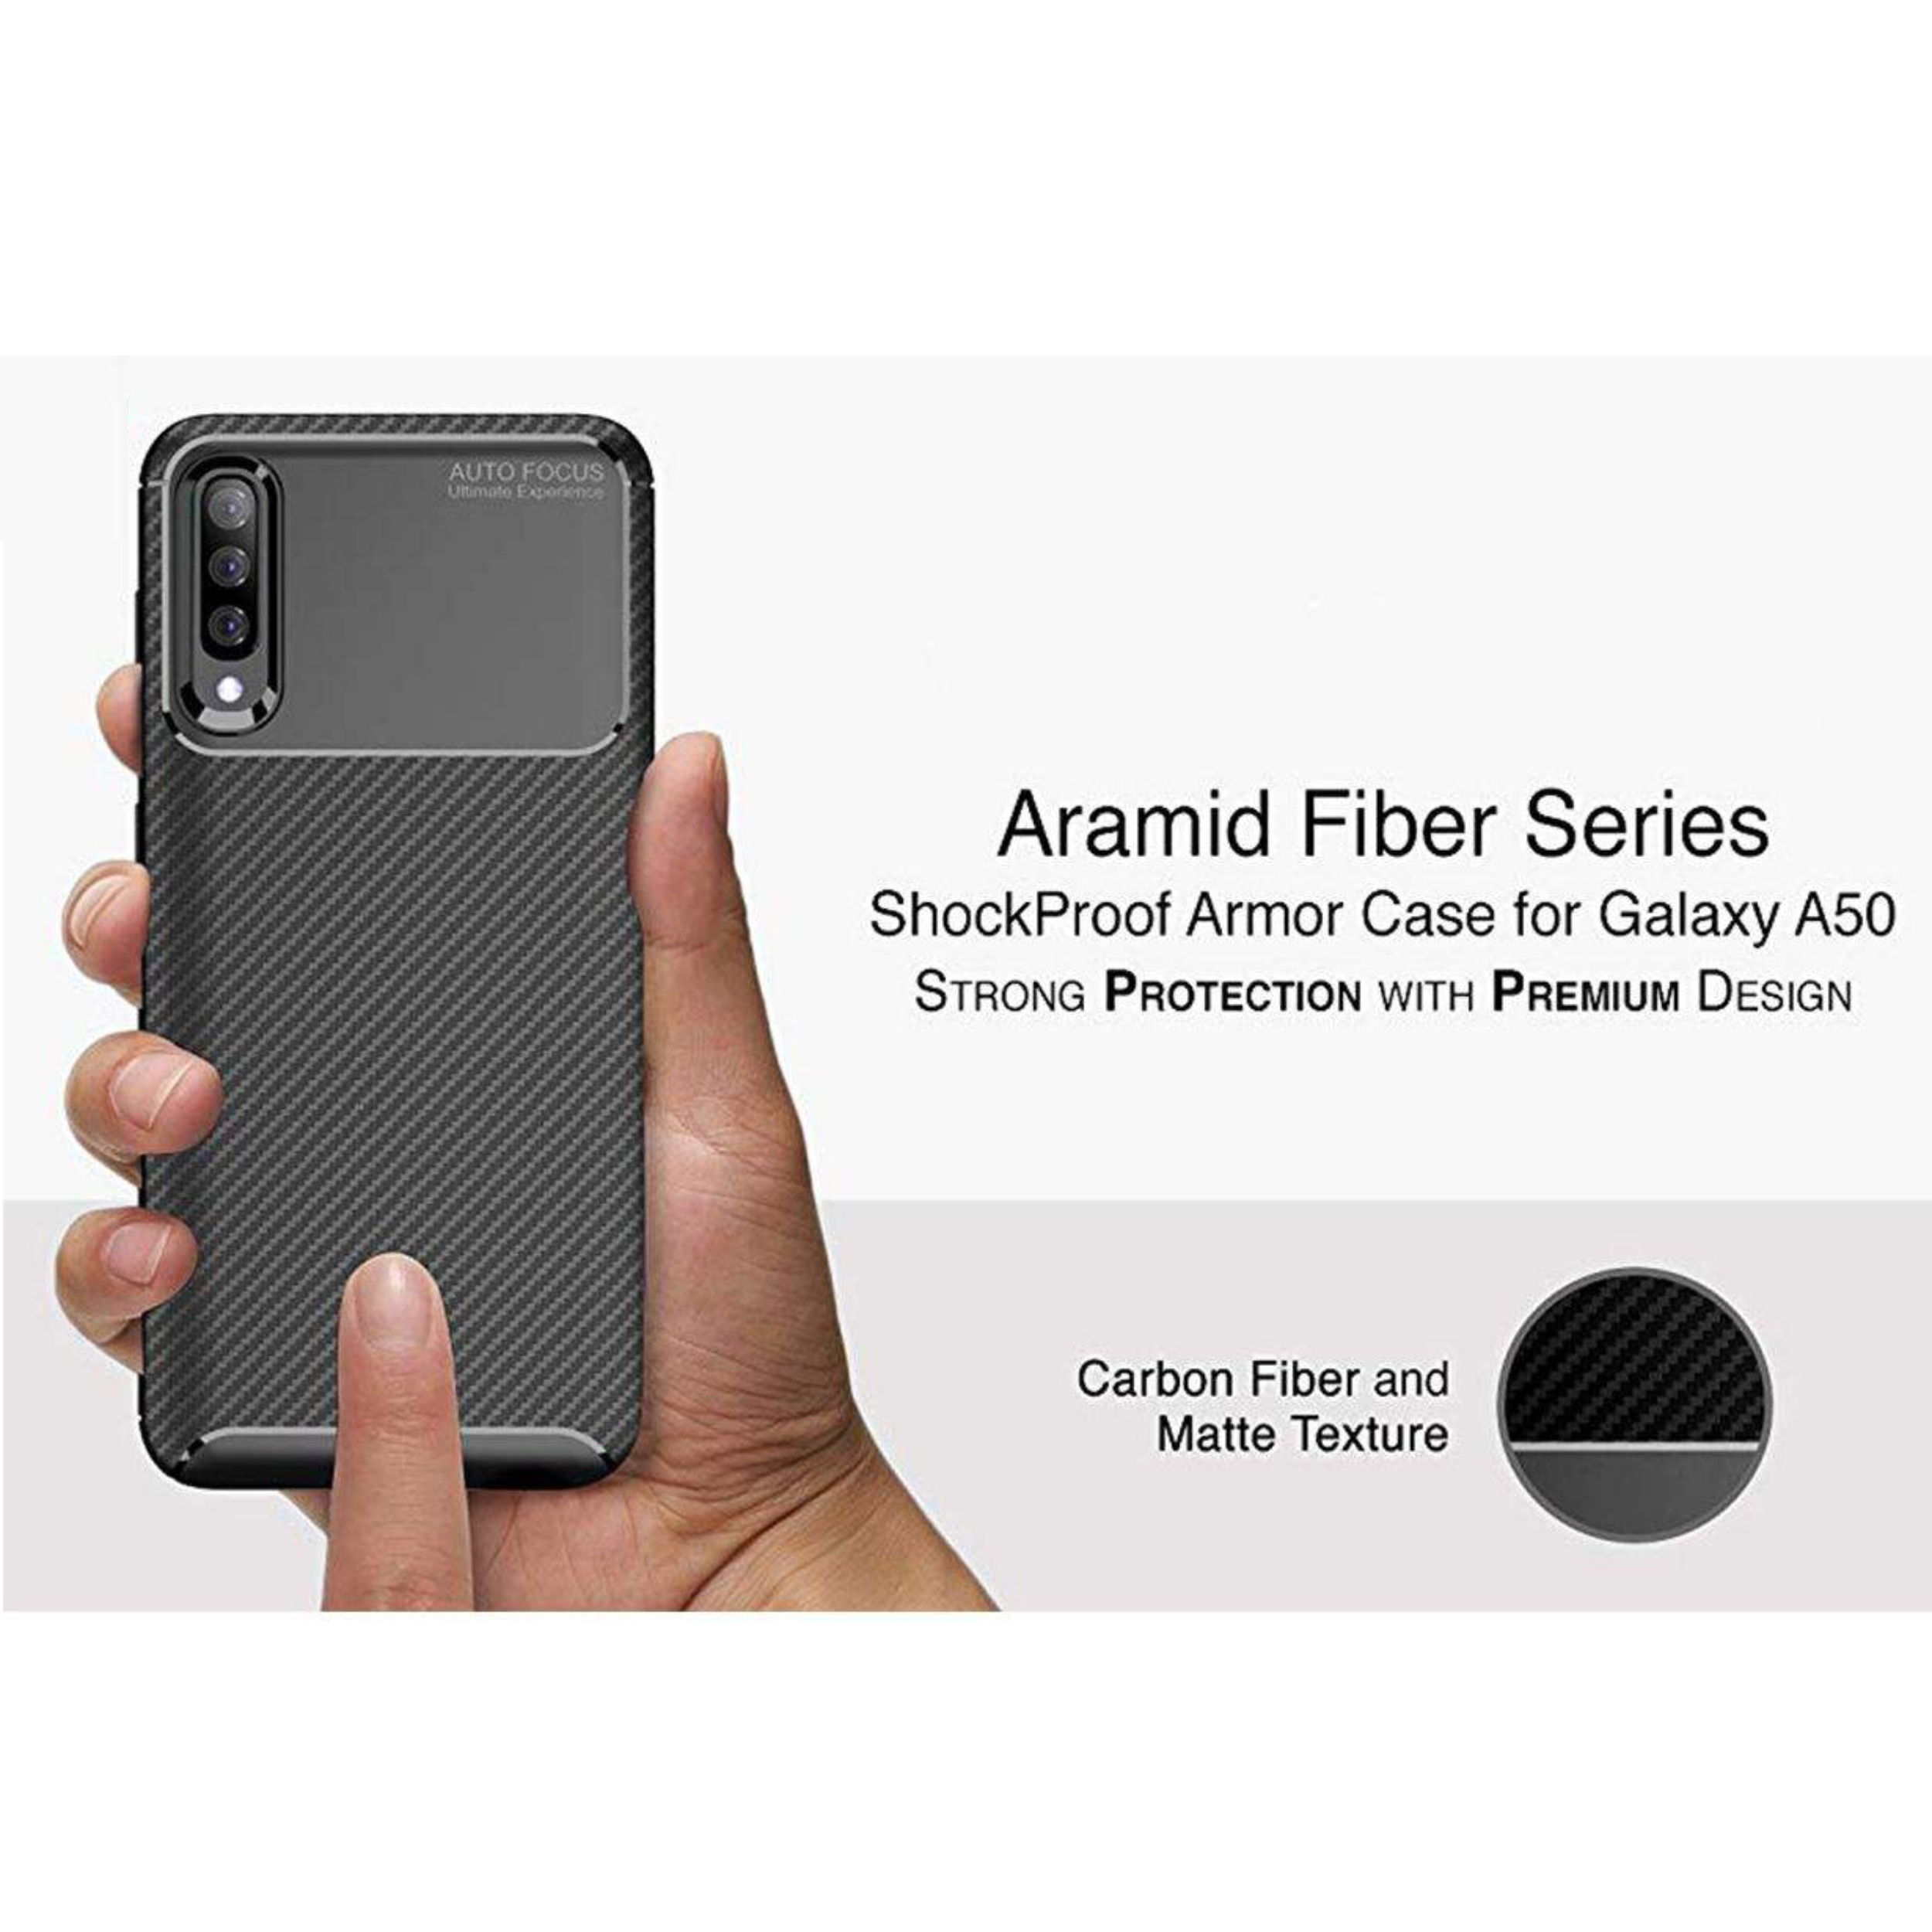 کاور لاین کینگ مدل A21 مناسب برای گوشی موبایل سامسونگ Galaxy A70/ A70S thumb 2 4